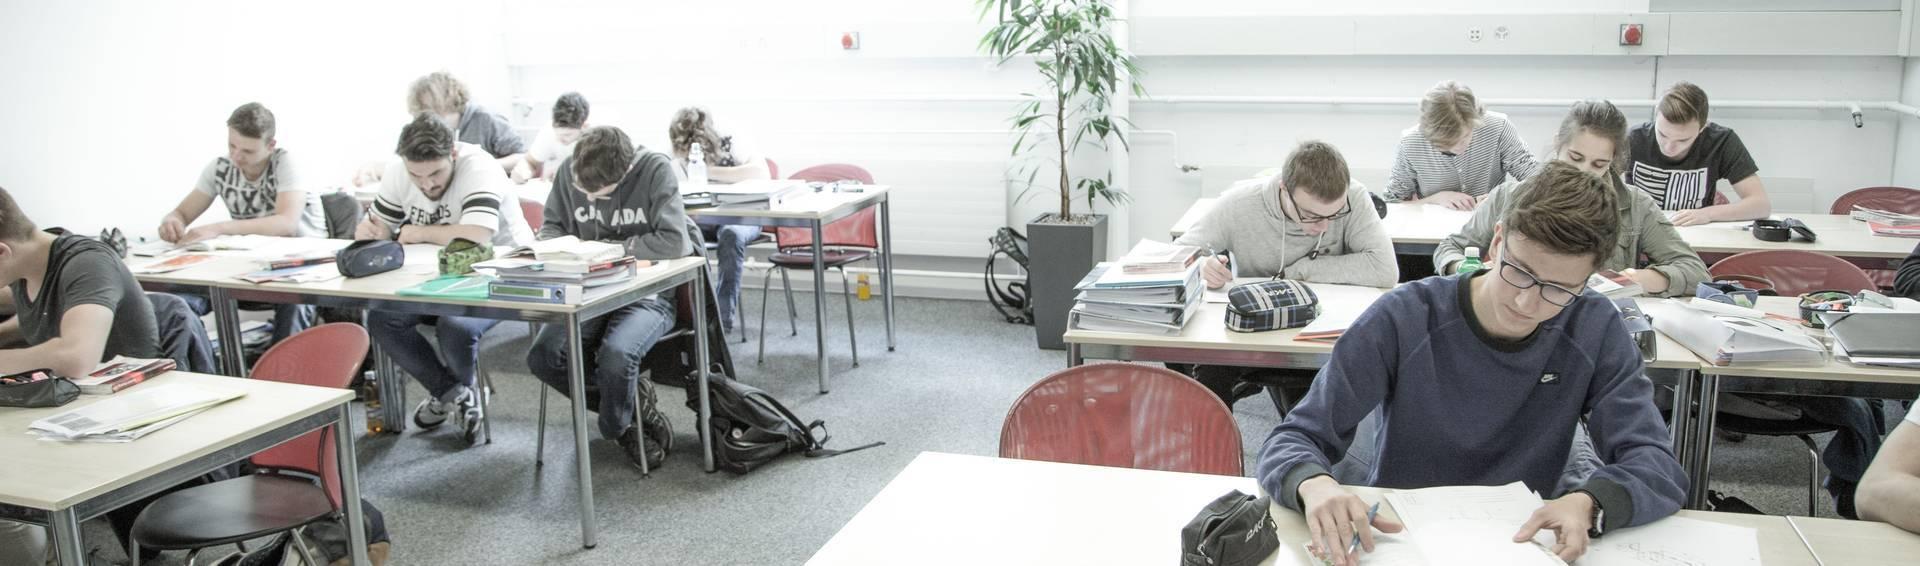 Konstrukteur/in EFZ: VAKB-Zwischenprüfung